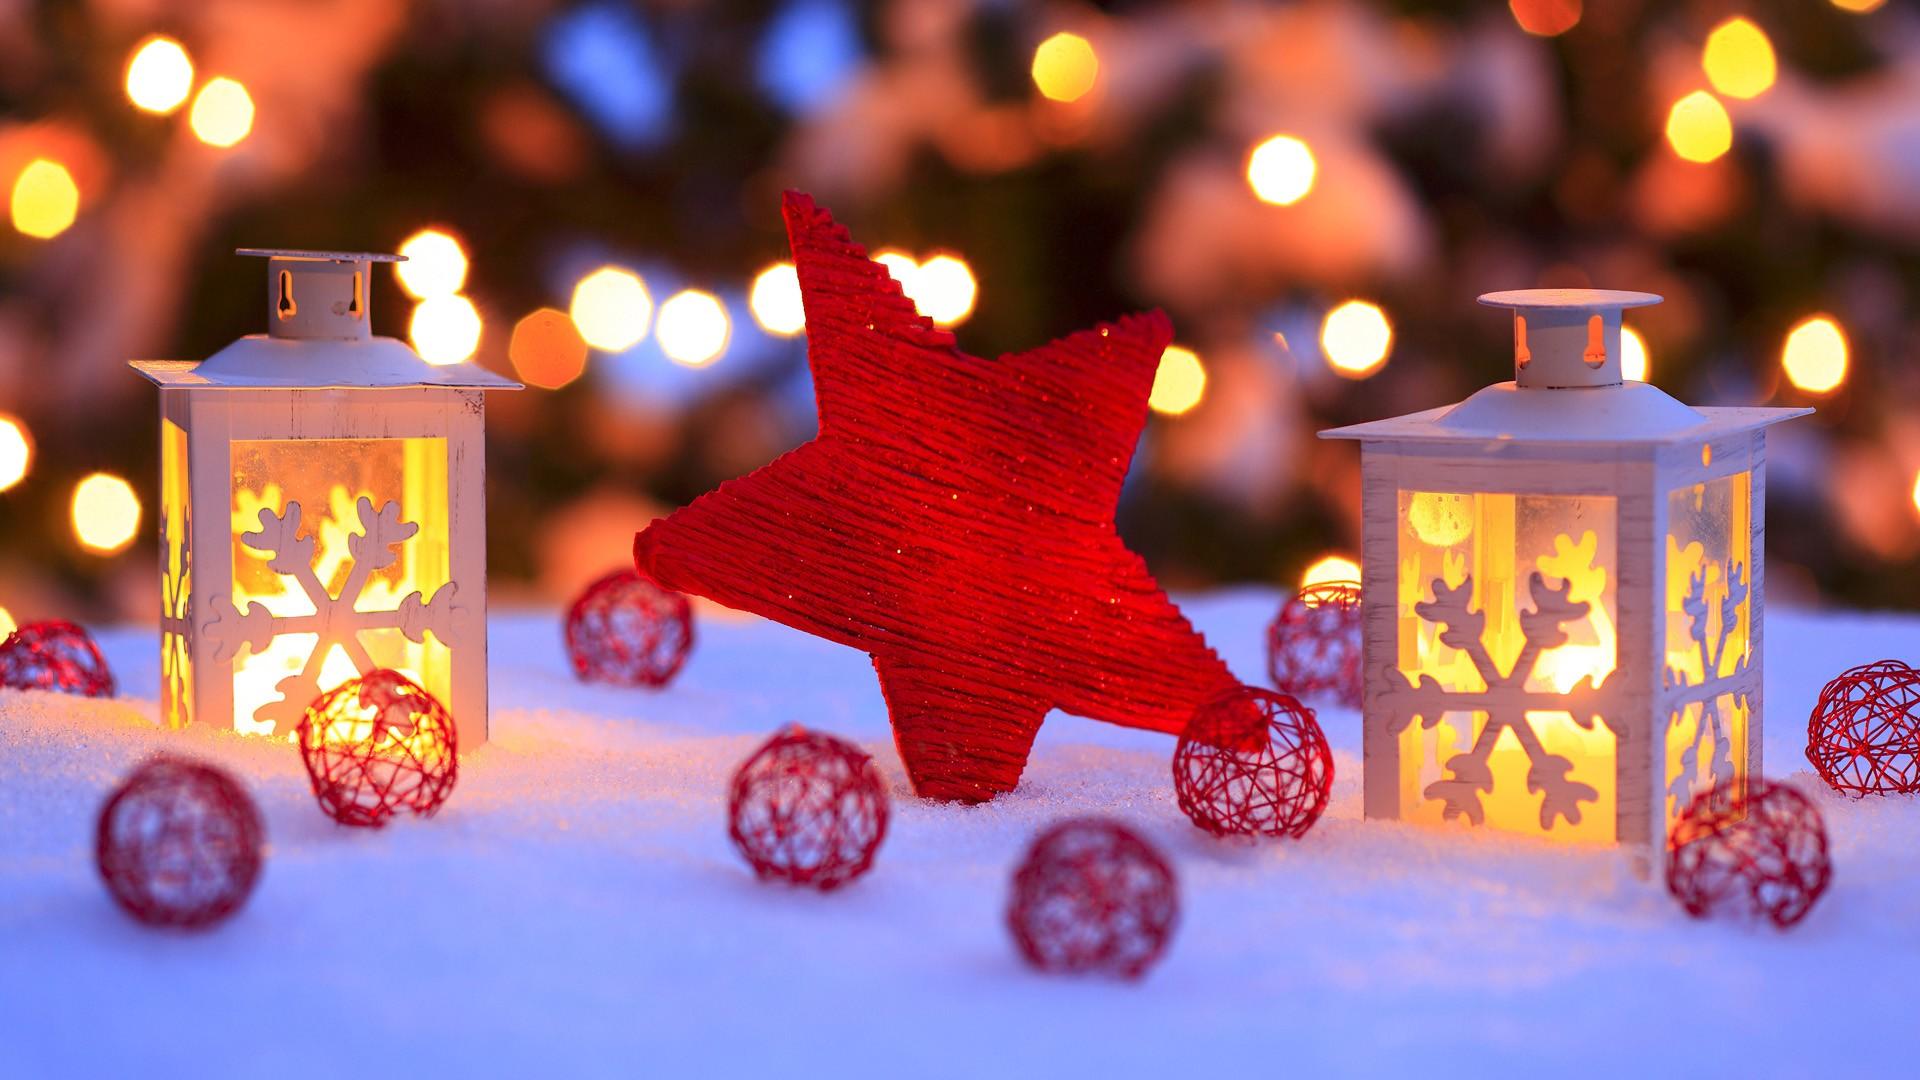 Sfondo Natalizio - Sfondo Natalizio Stella Natale